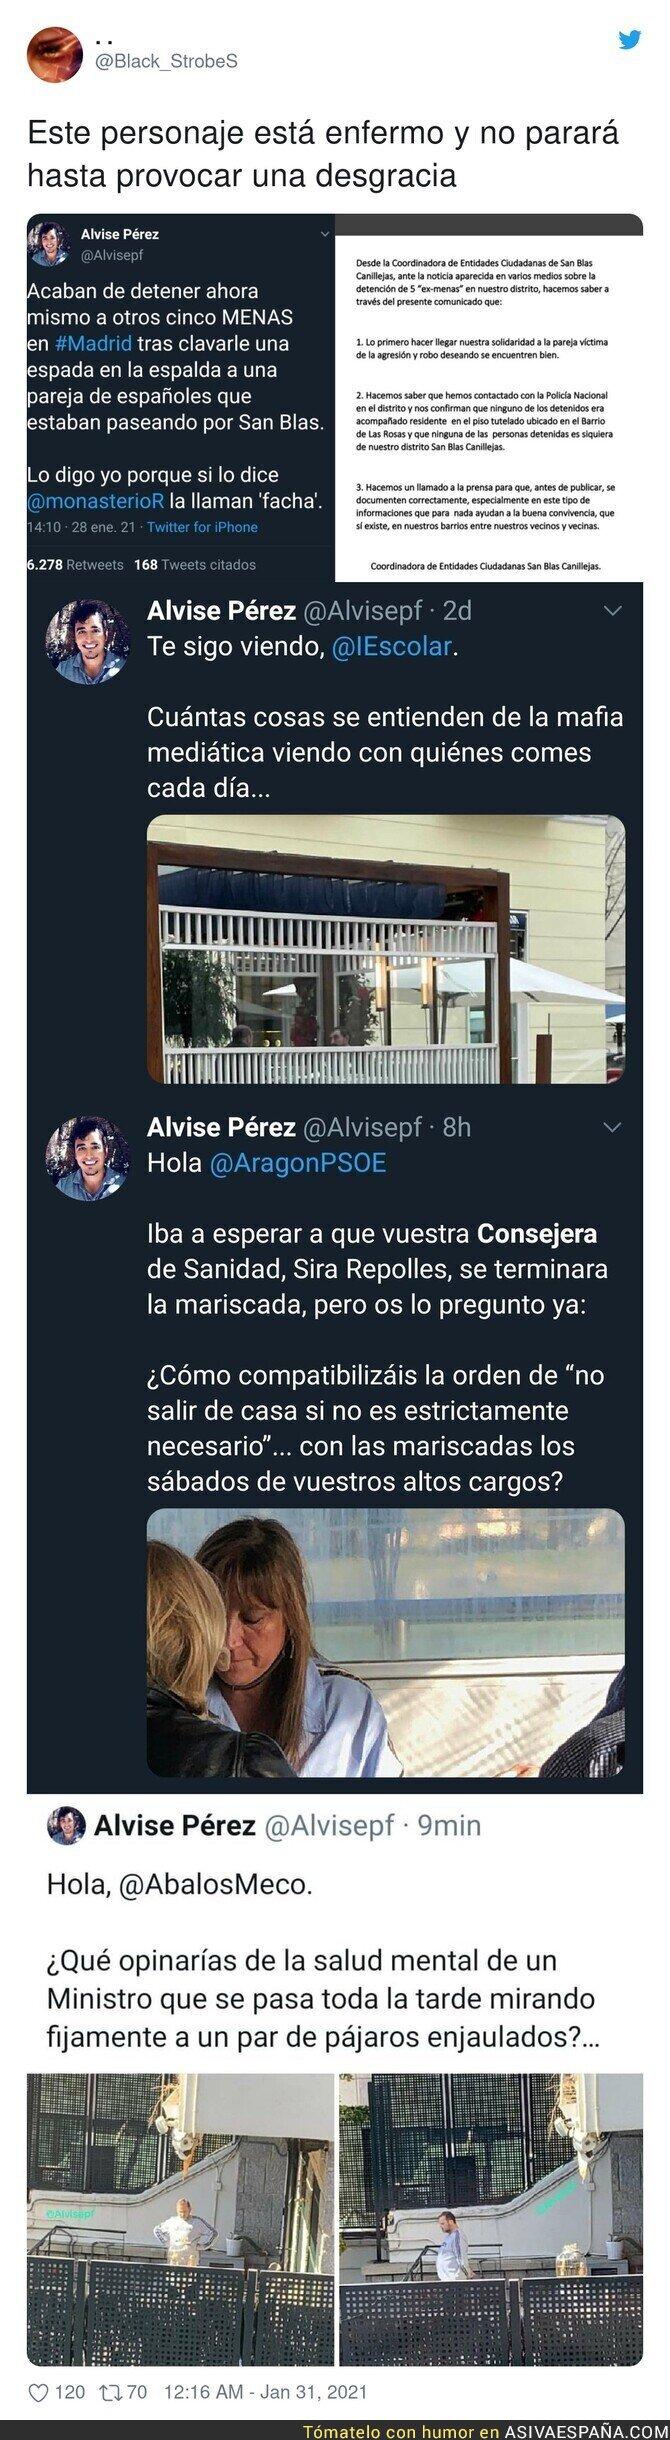 578233 - Contra esta basura de Alvise Pérez tiene que actuar la ley